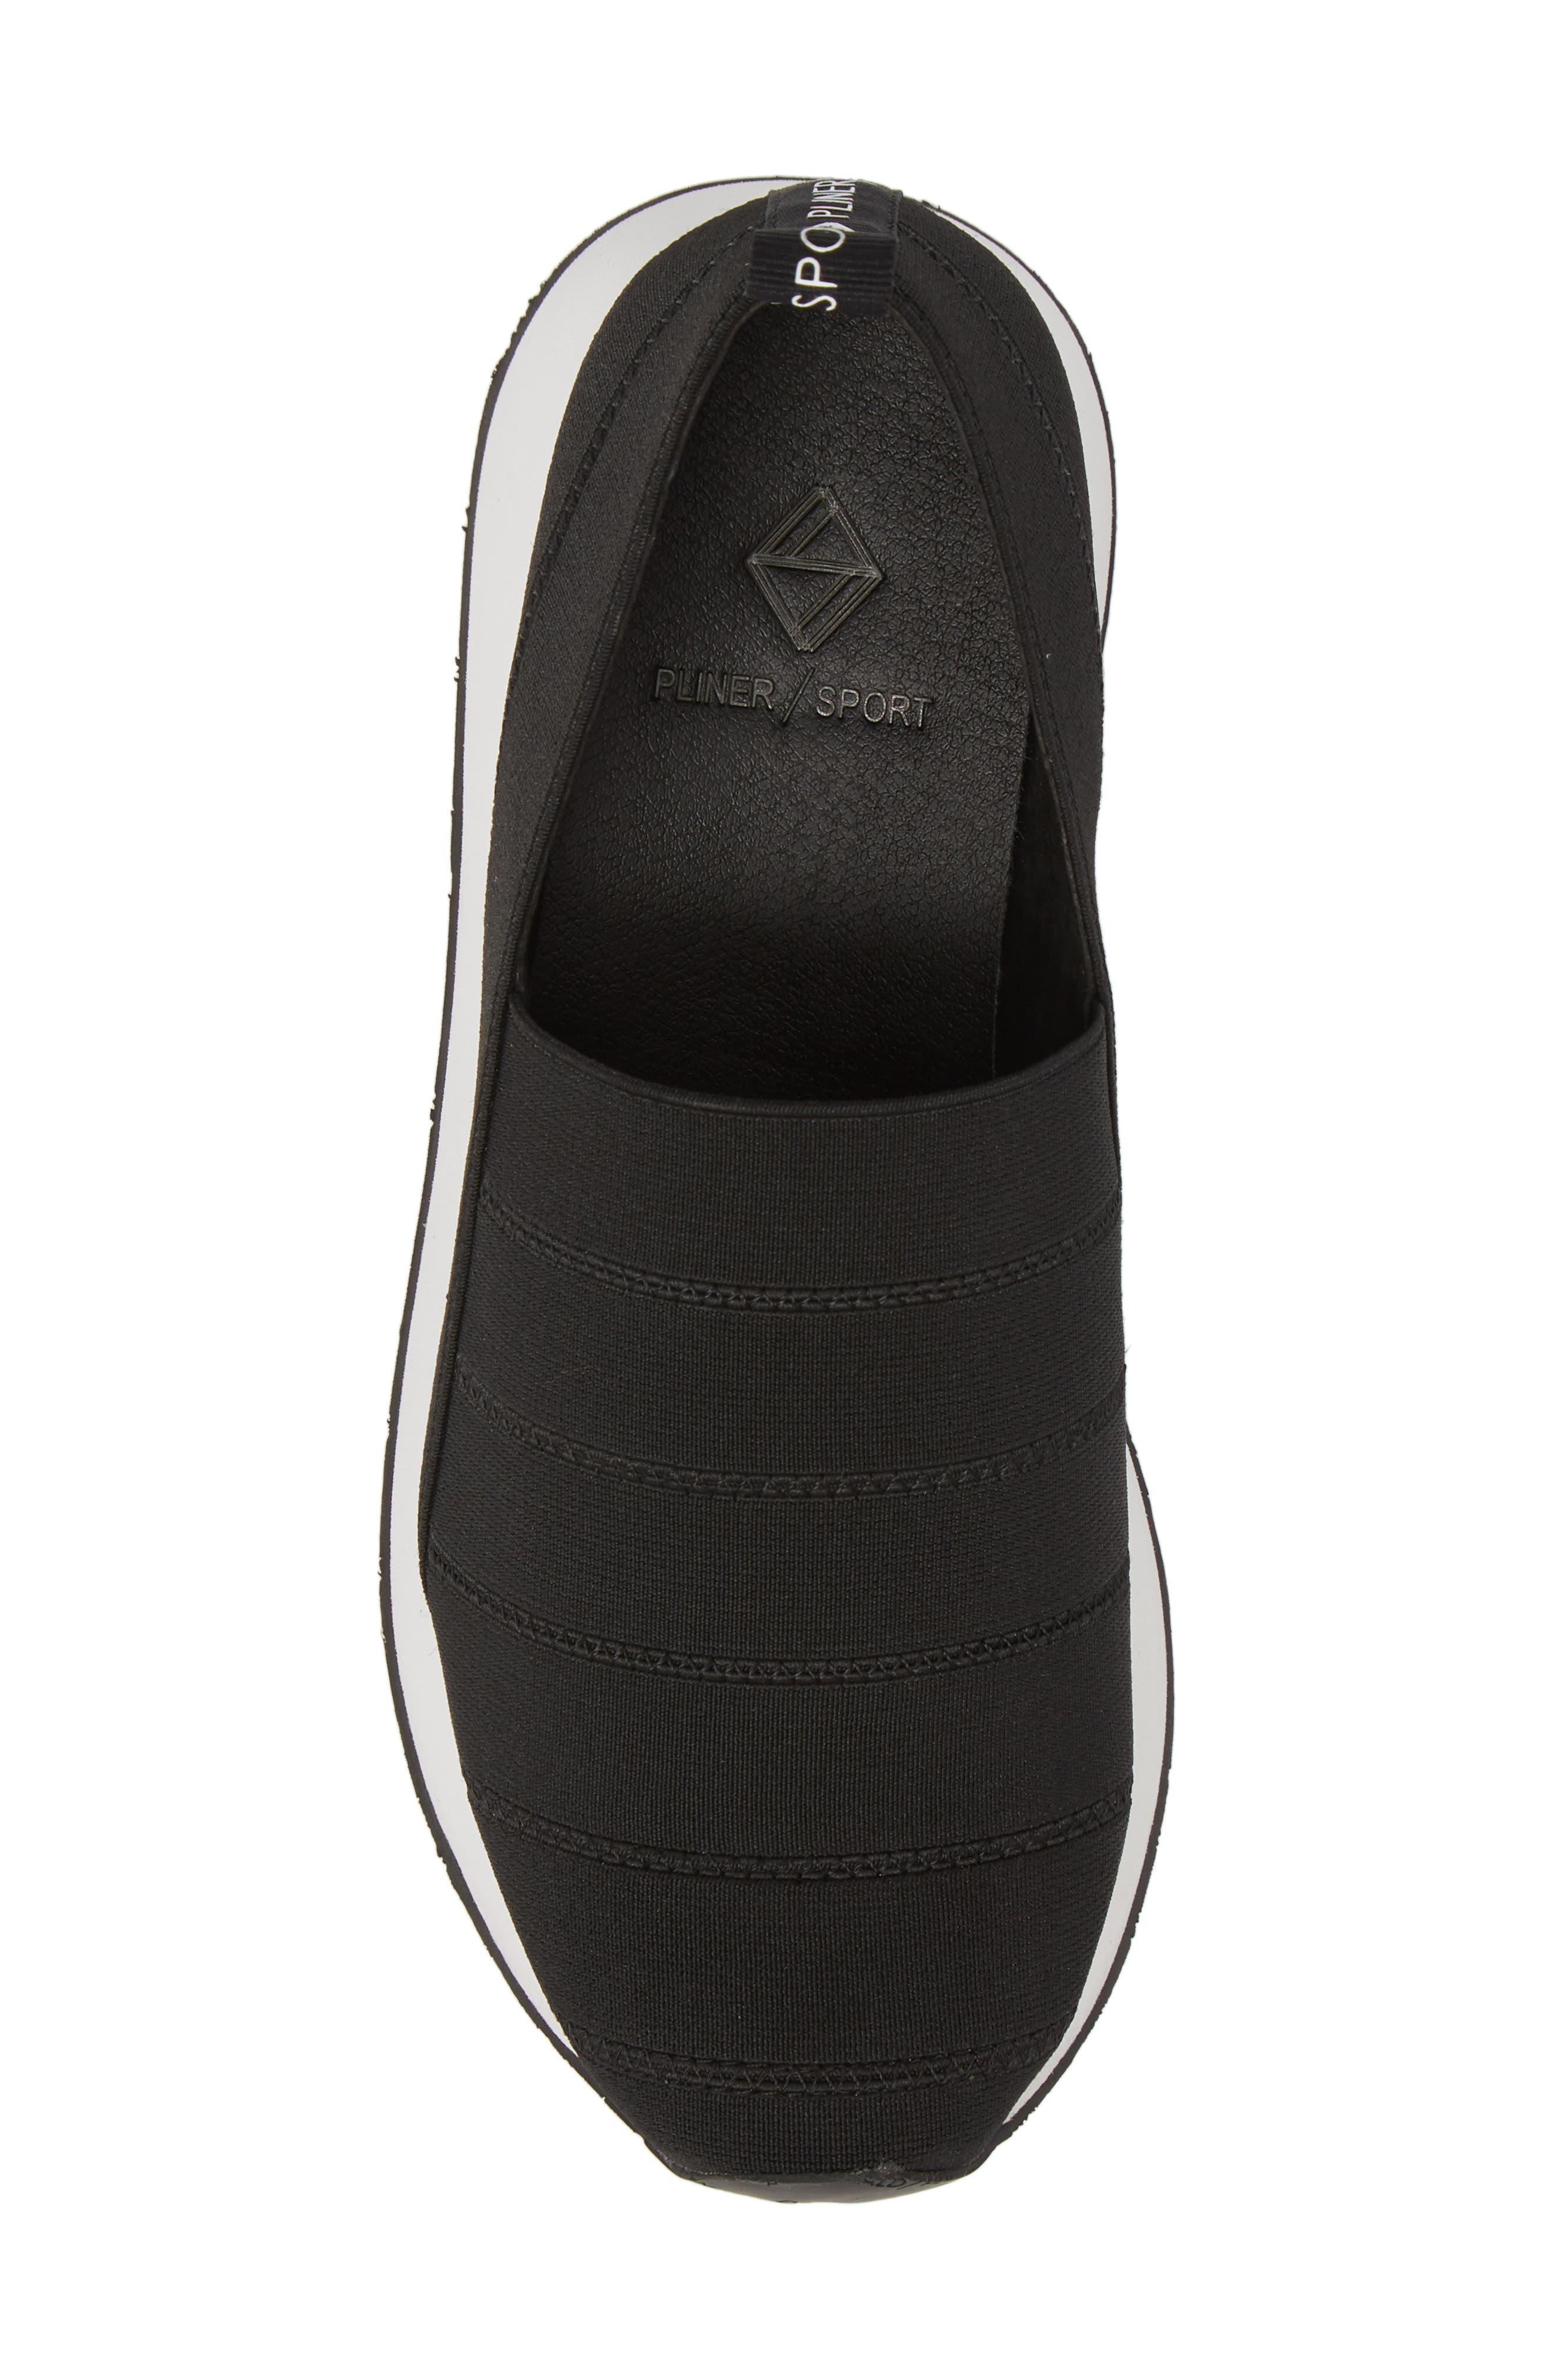 Piper Platform Slip-On Sneaker,                             Alternate thumbnail 5, color,                             BLACK STRETCH FABRIC